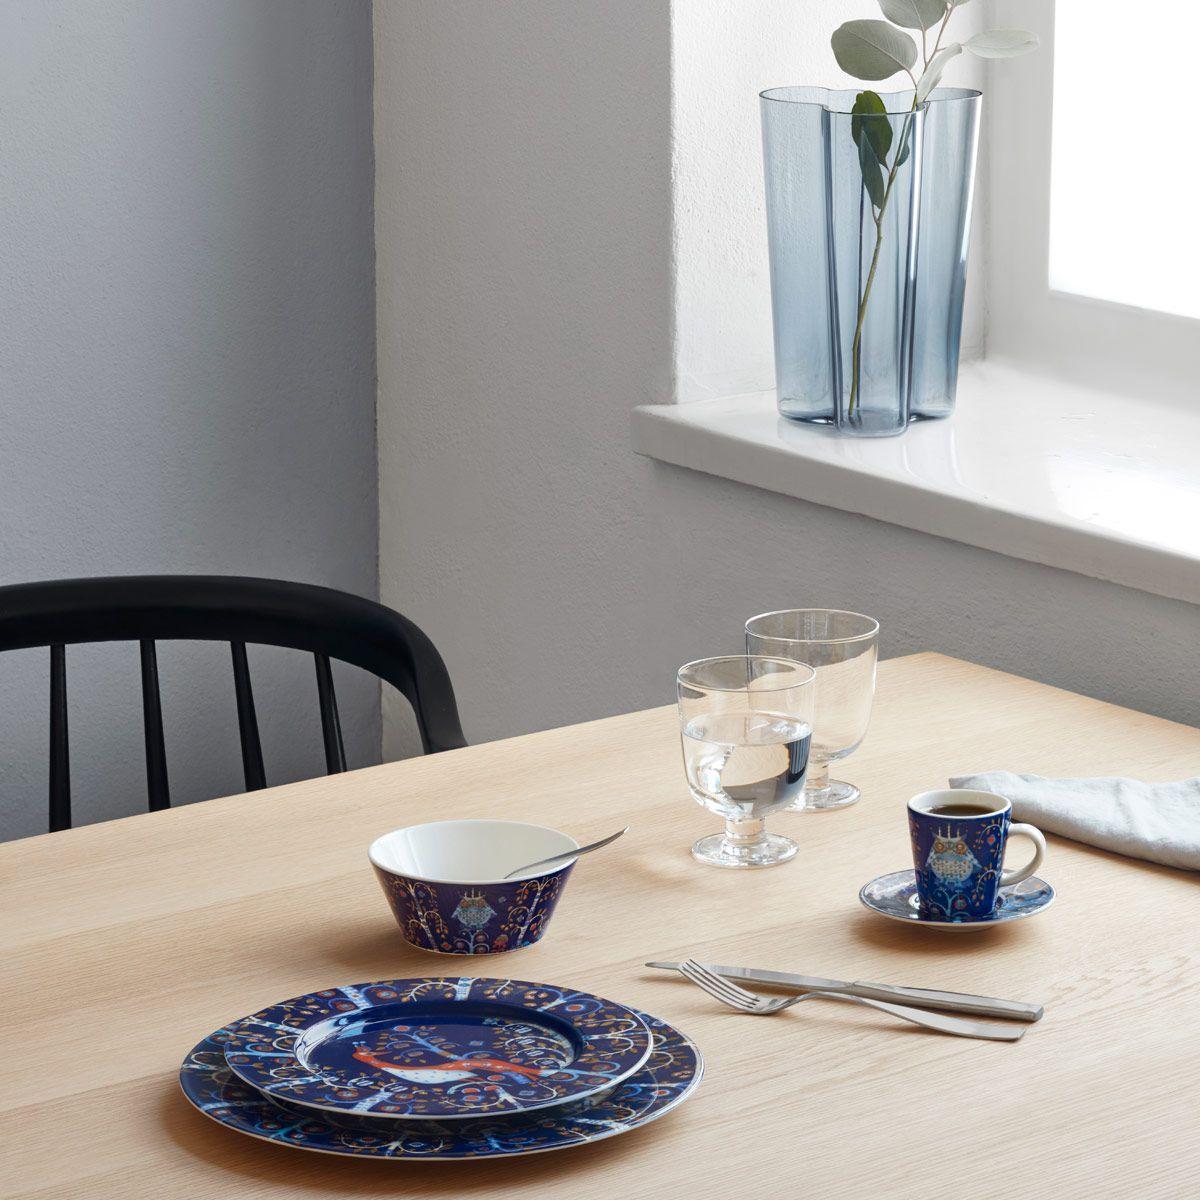 iittala Taika Blue Dinnerware Starter Set & iittala Taika Blue Dinnerware Starter Set | Iittala and Dinnerware